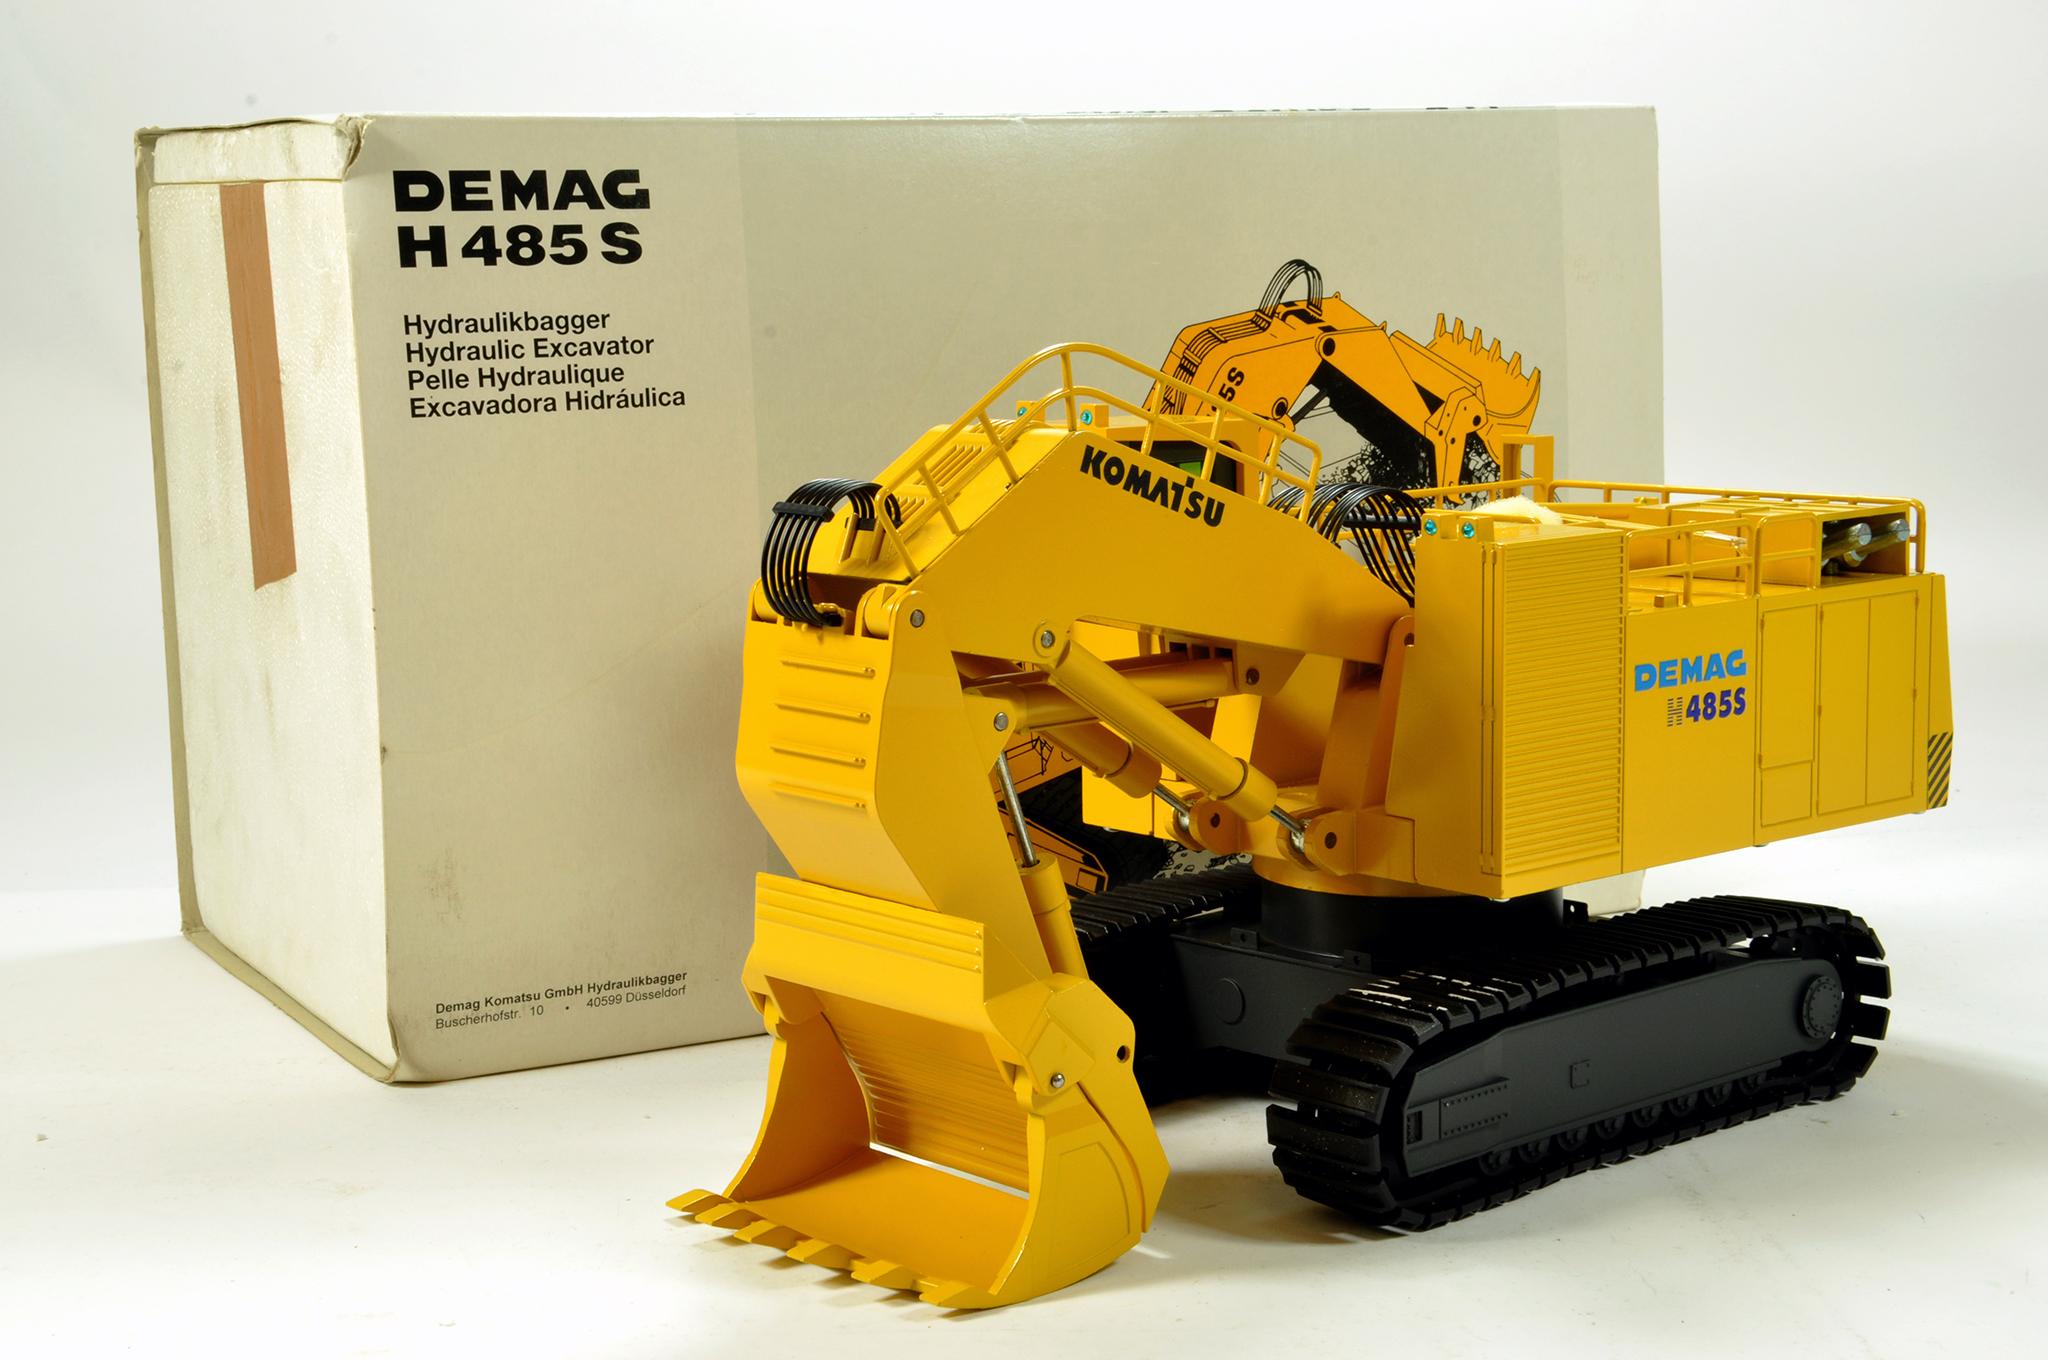 Lot 306 - NZG 1/50 construction issue comprising No. 357 Komatsu DEMAG 485S Hydraulic Excavator. Generally E